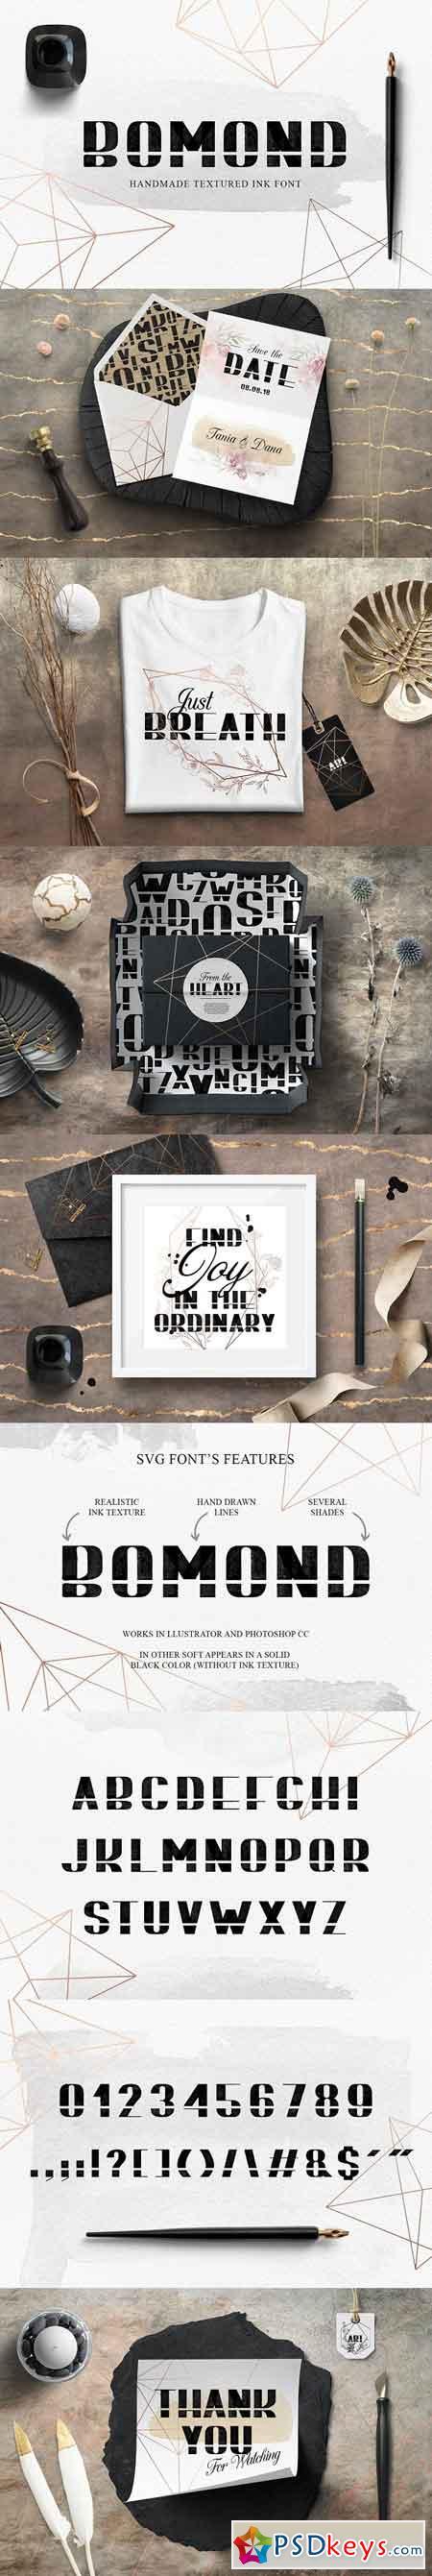 BOMOND Textured Ink Font 2473276